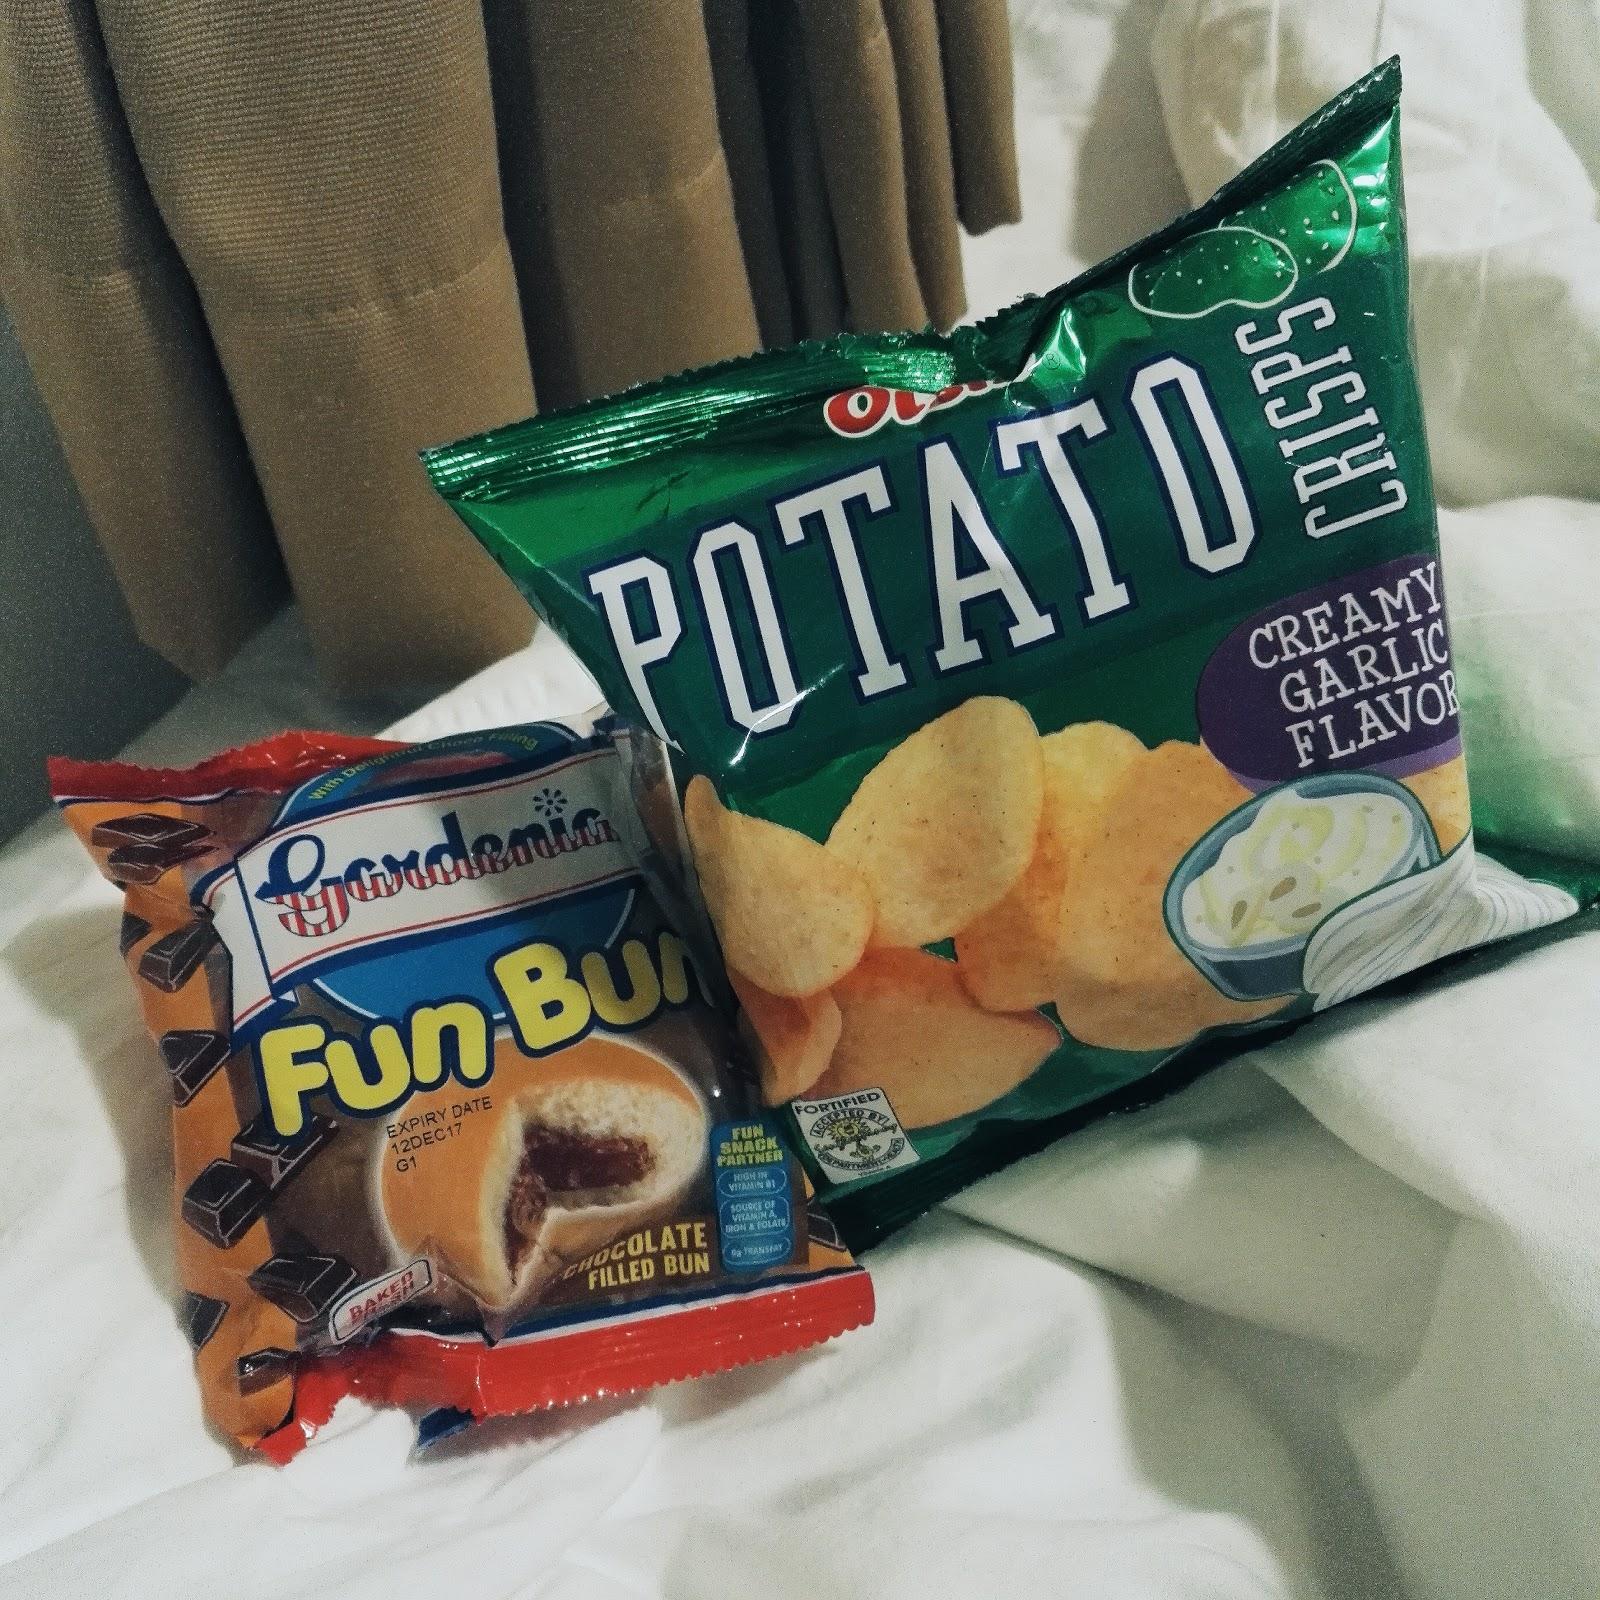 Filippiinien dating chat-huone